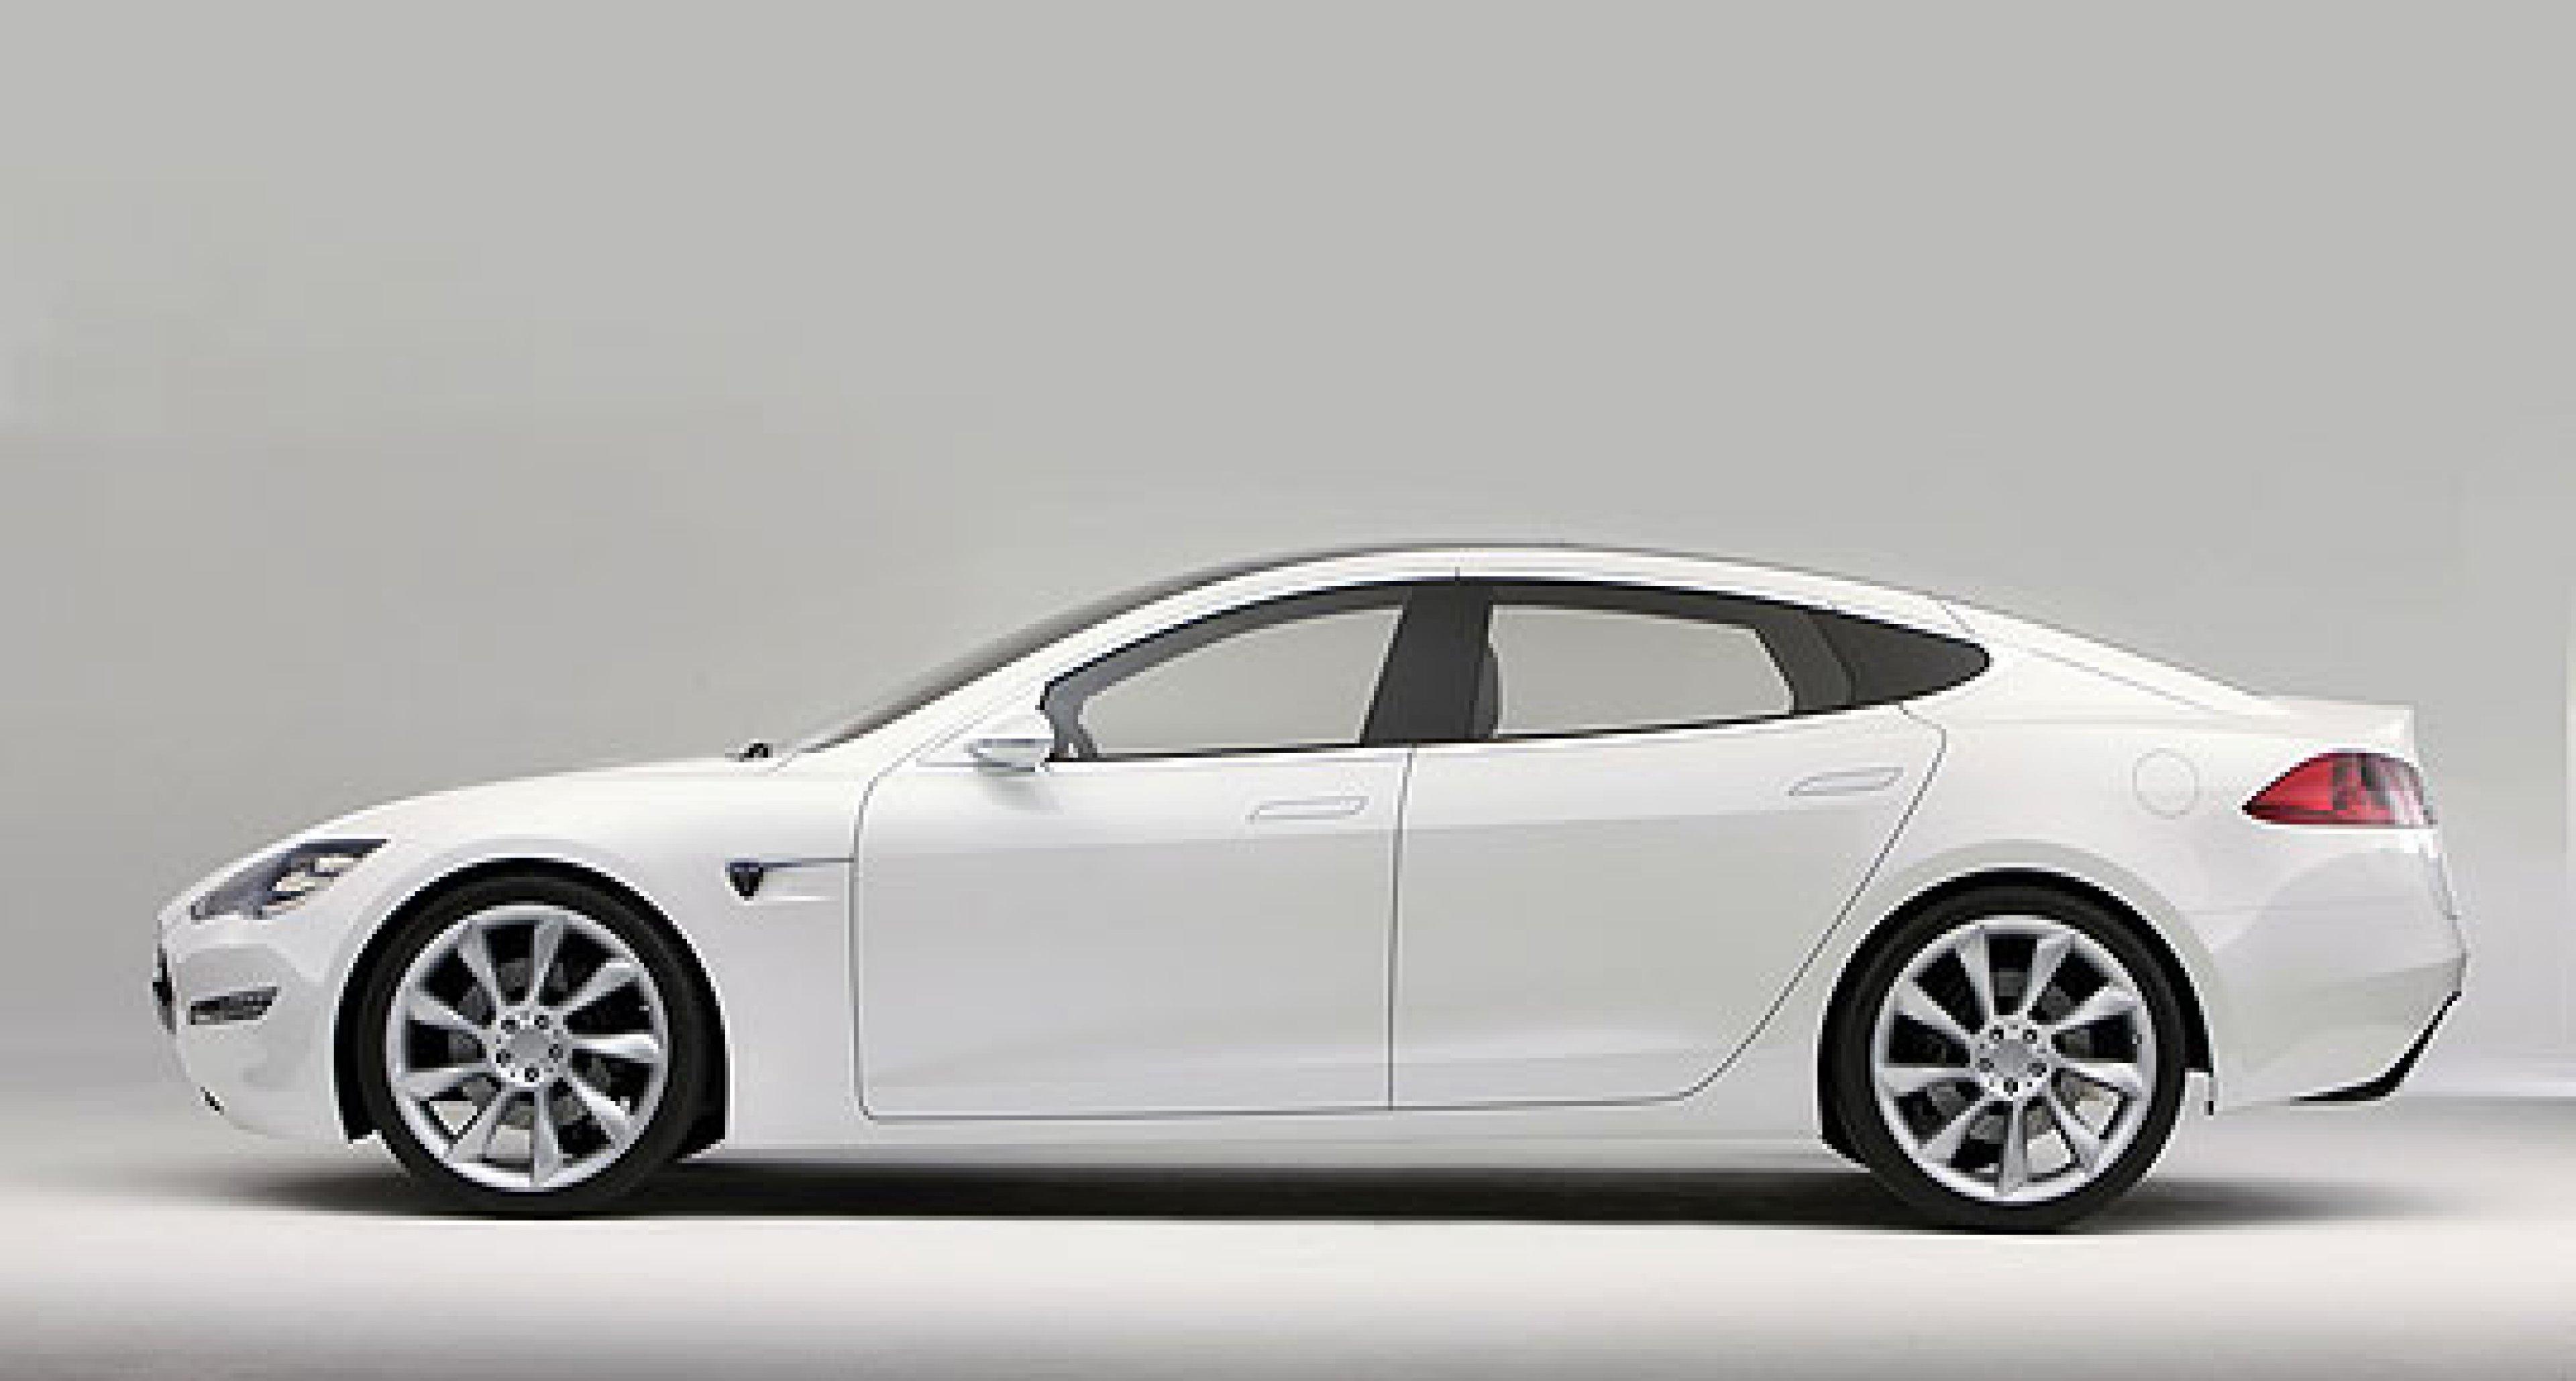 Tesla Model S: the Electric Saloon